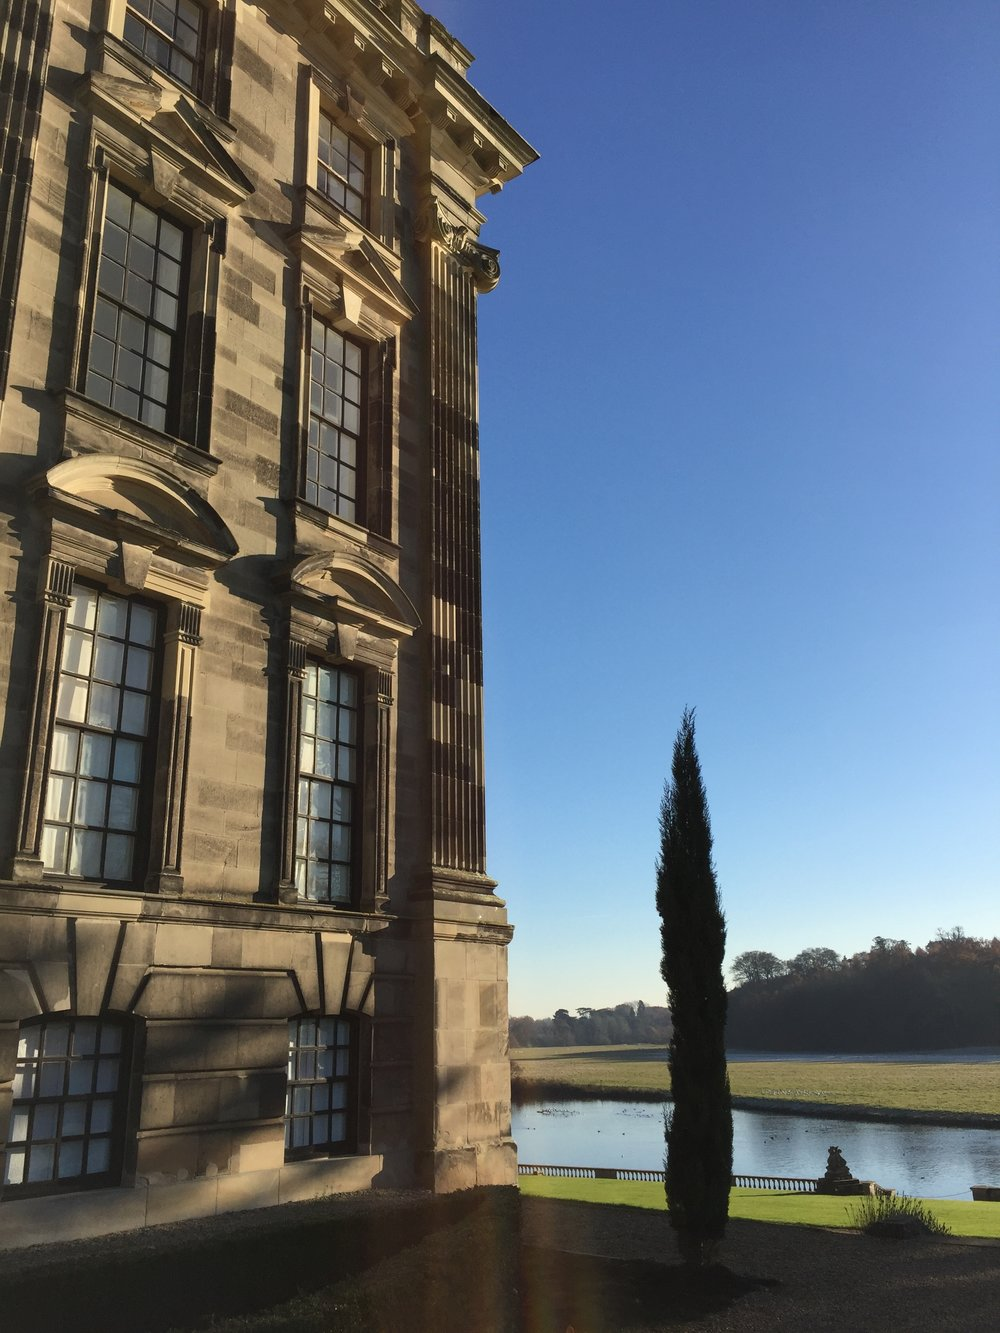 lakeside gardens stoneleigh abbey